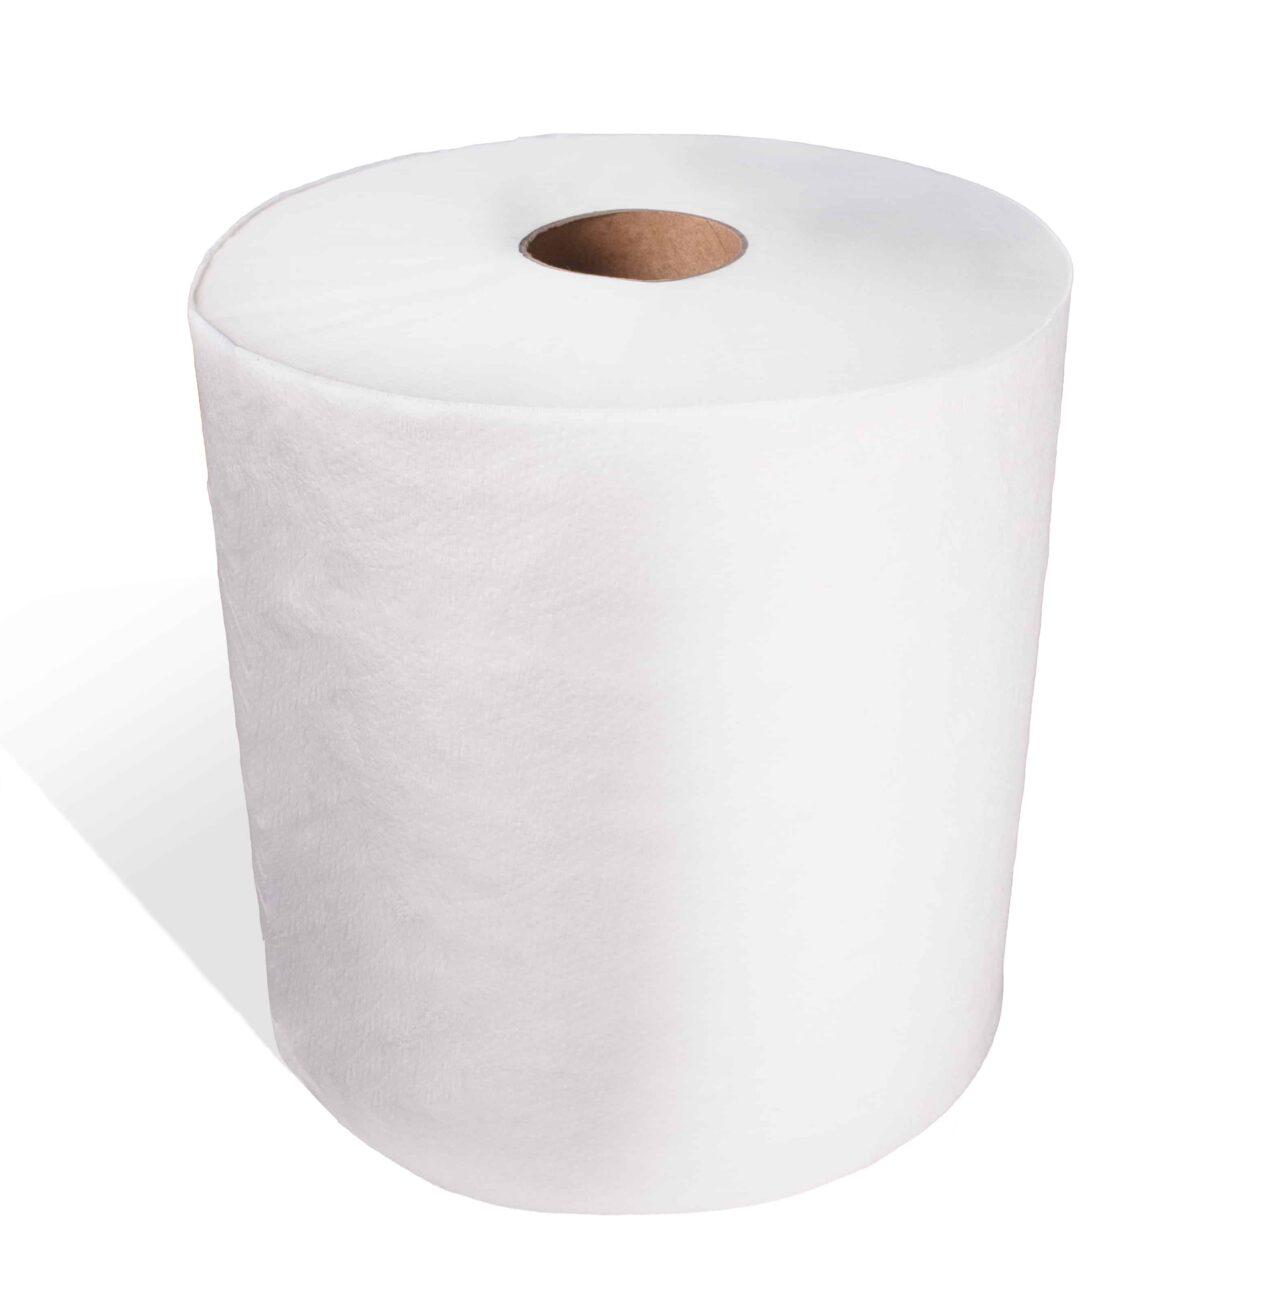 Essuie-mains blanc, économique (12 x 425′)